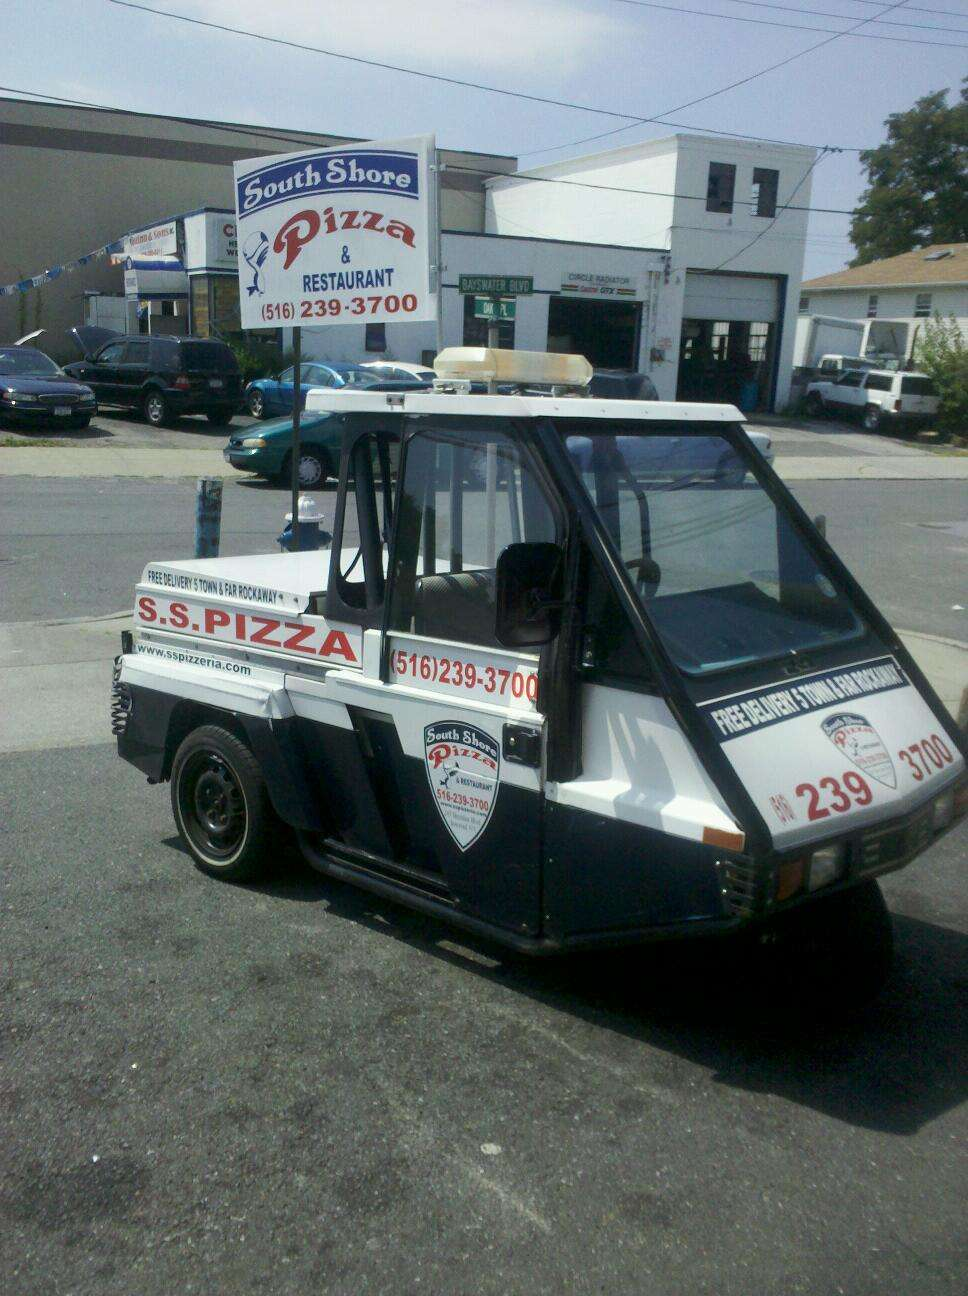 South Shore Pizzeria - restaurant  | Photo 4 of 10 | Address: 245 Sheridan Blvd, Inwood, NY 11096, USA | Phone: (516) 239-3700